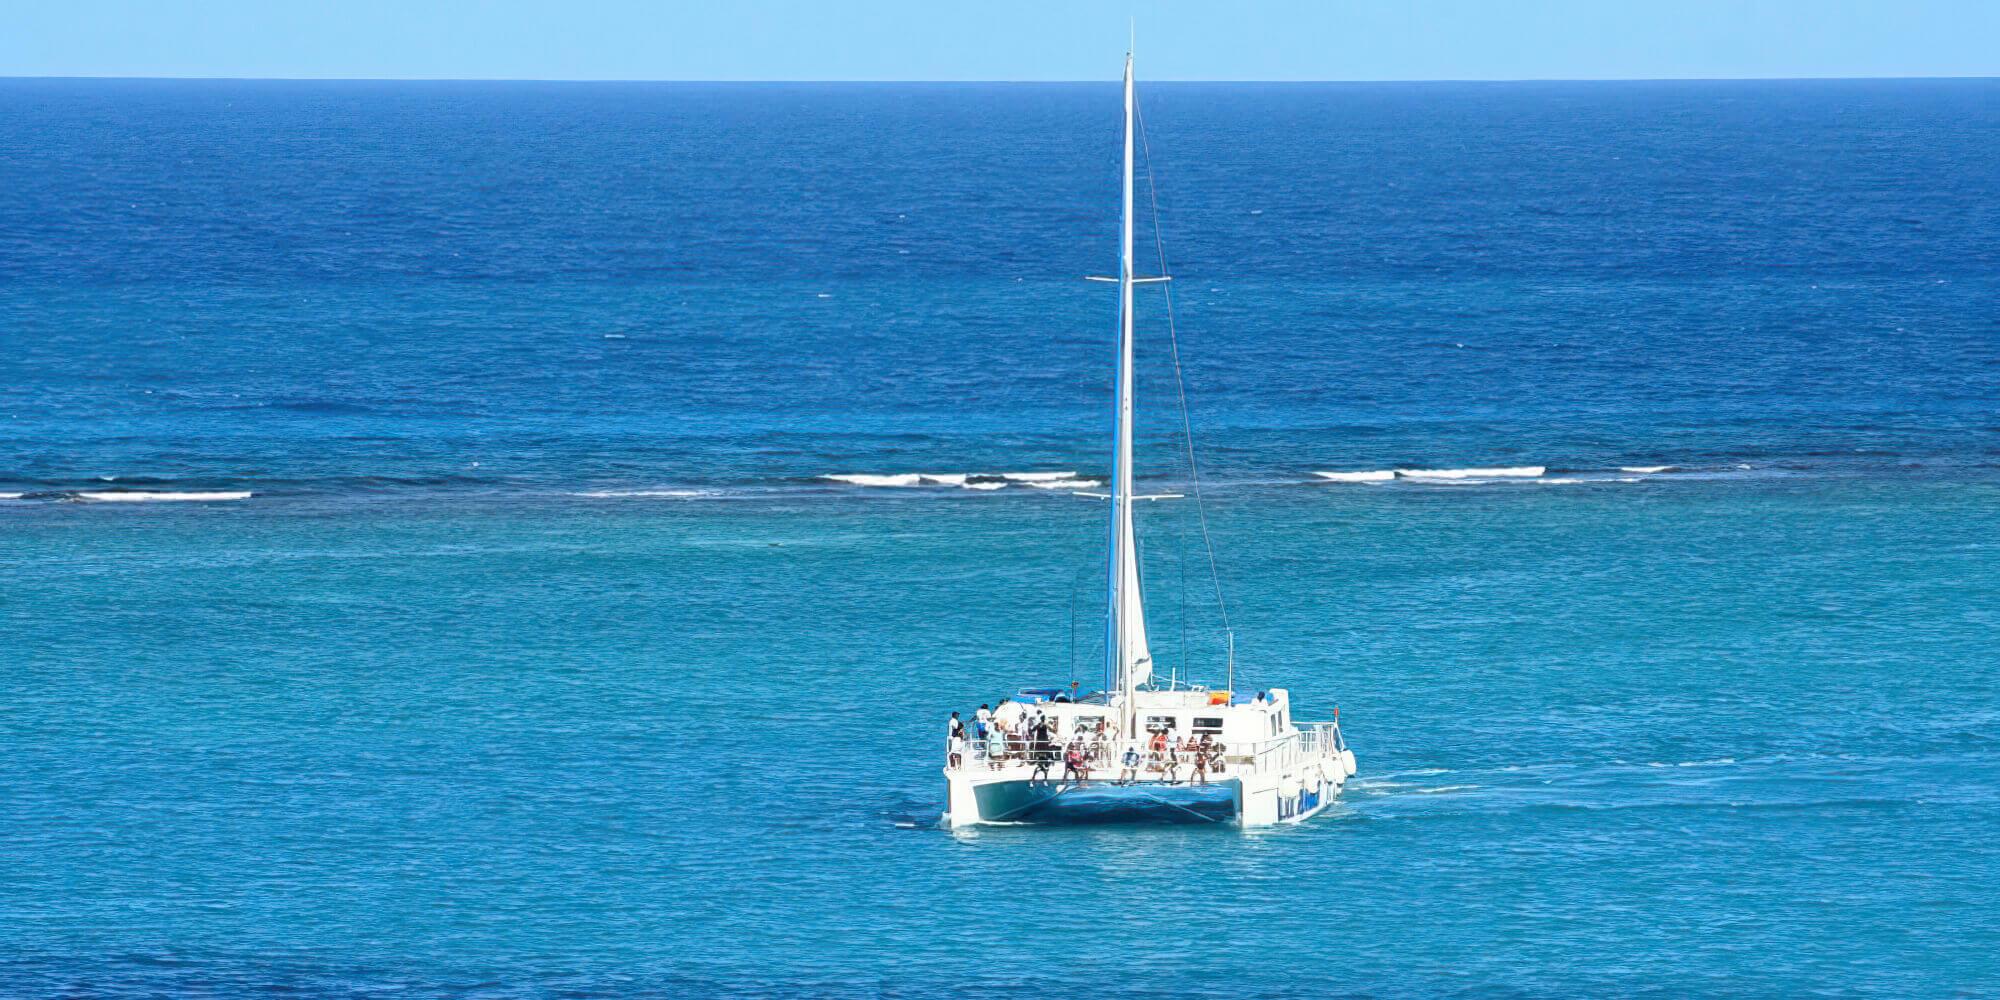 st thomas us virgin islands - catamaran tour